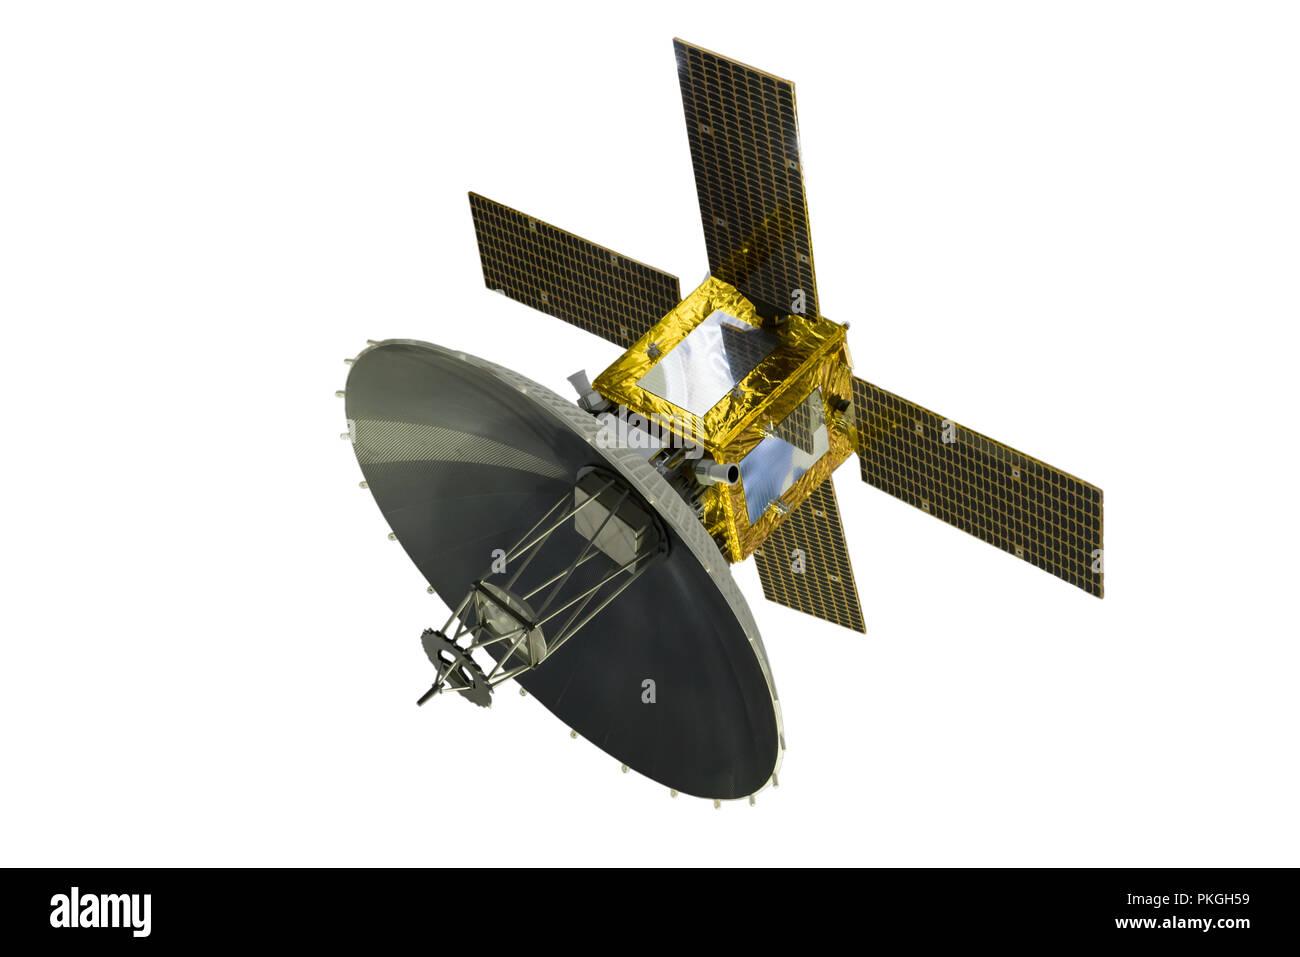 Satellite with solar panels, isolated on white background Stock Photo